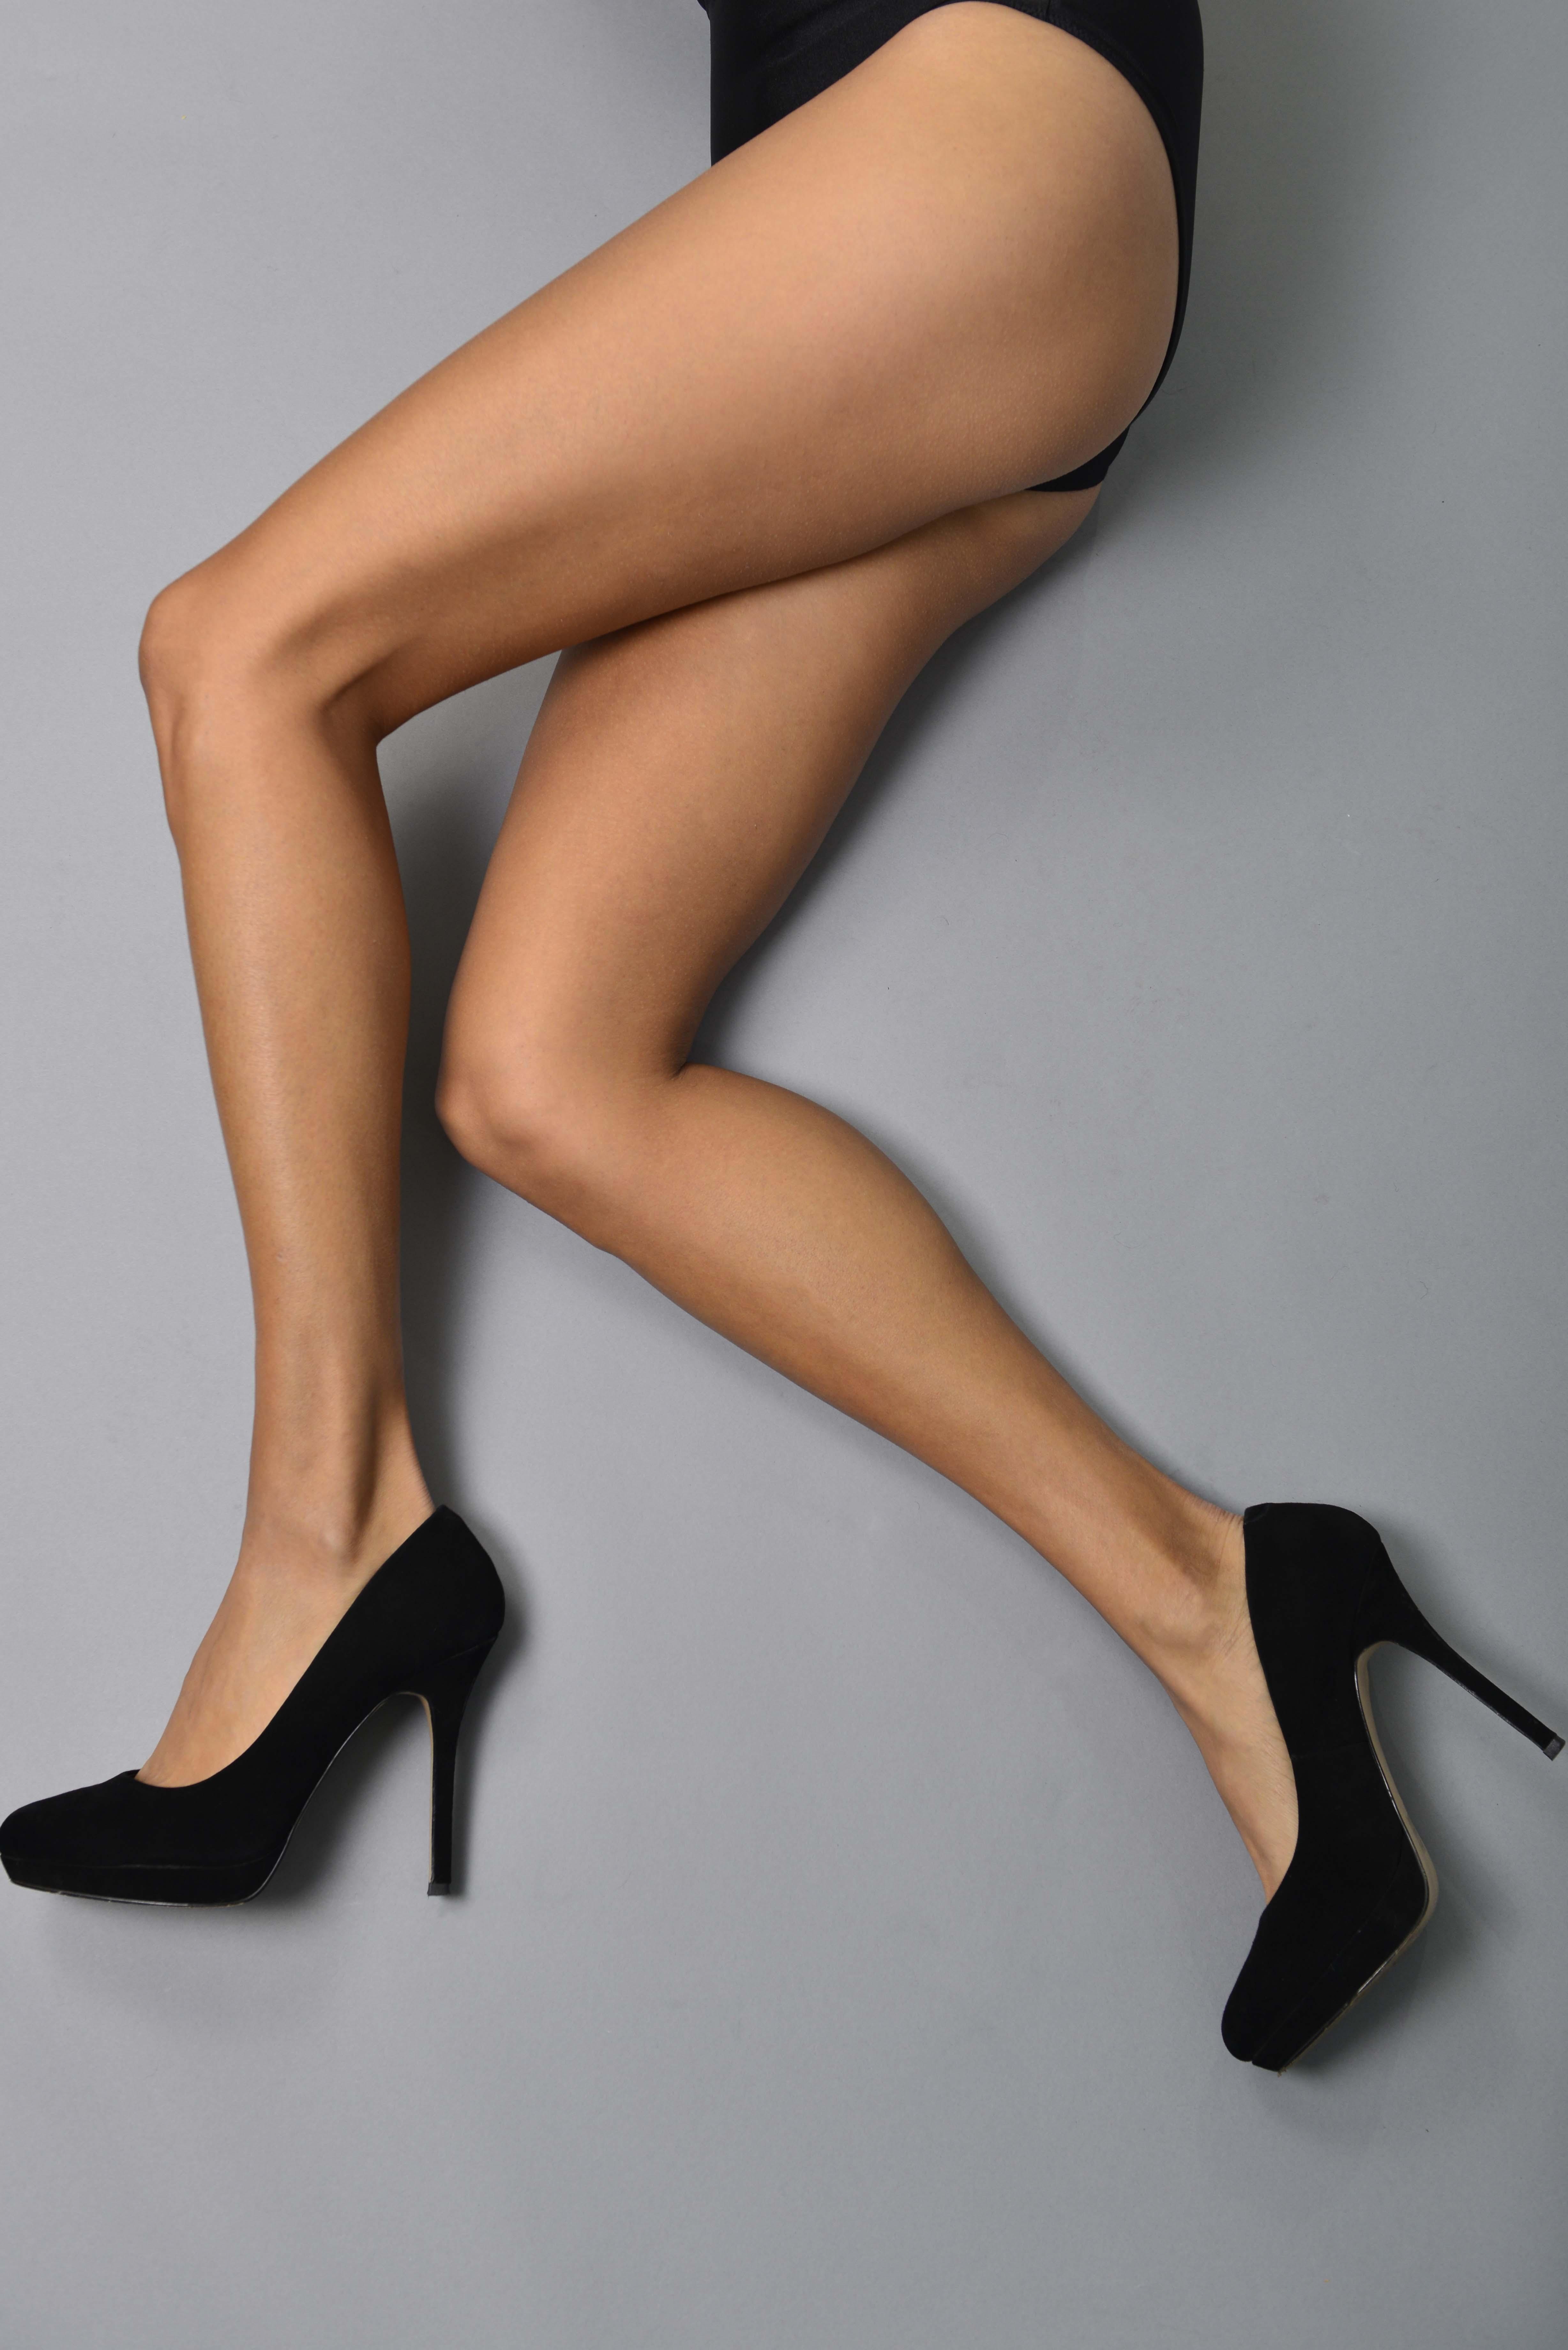 tehmina-sunny_legs3